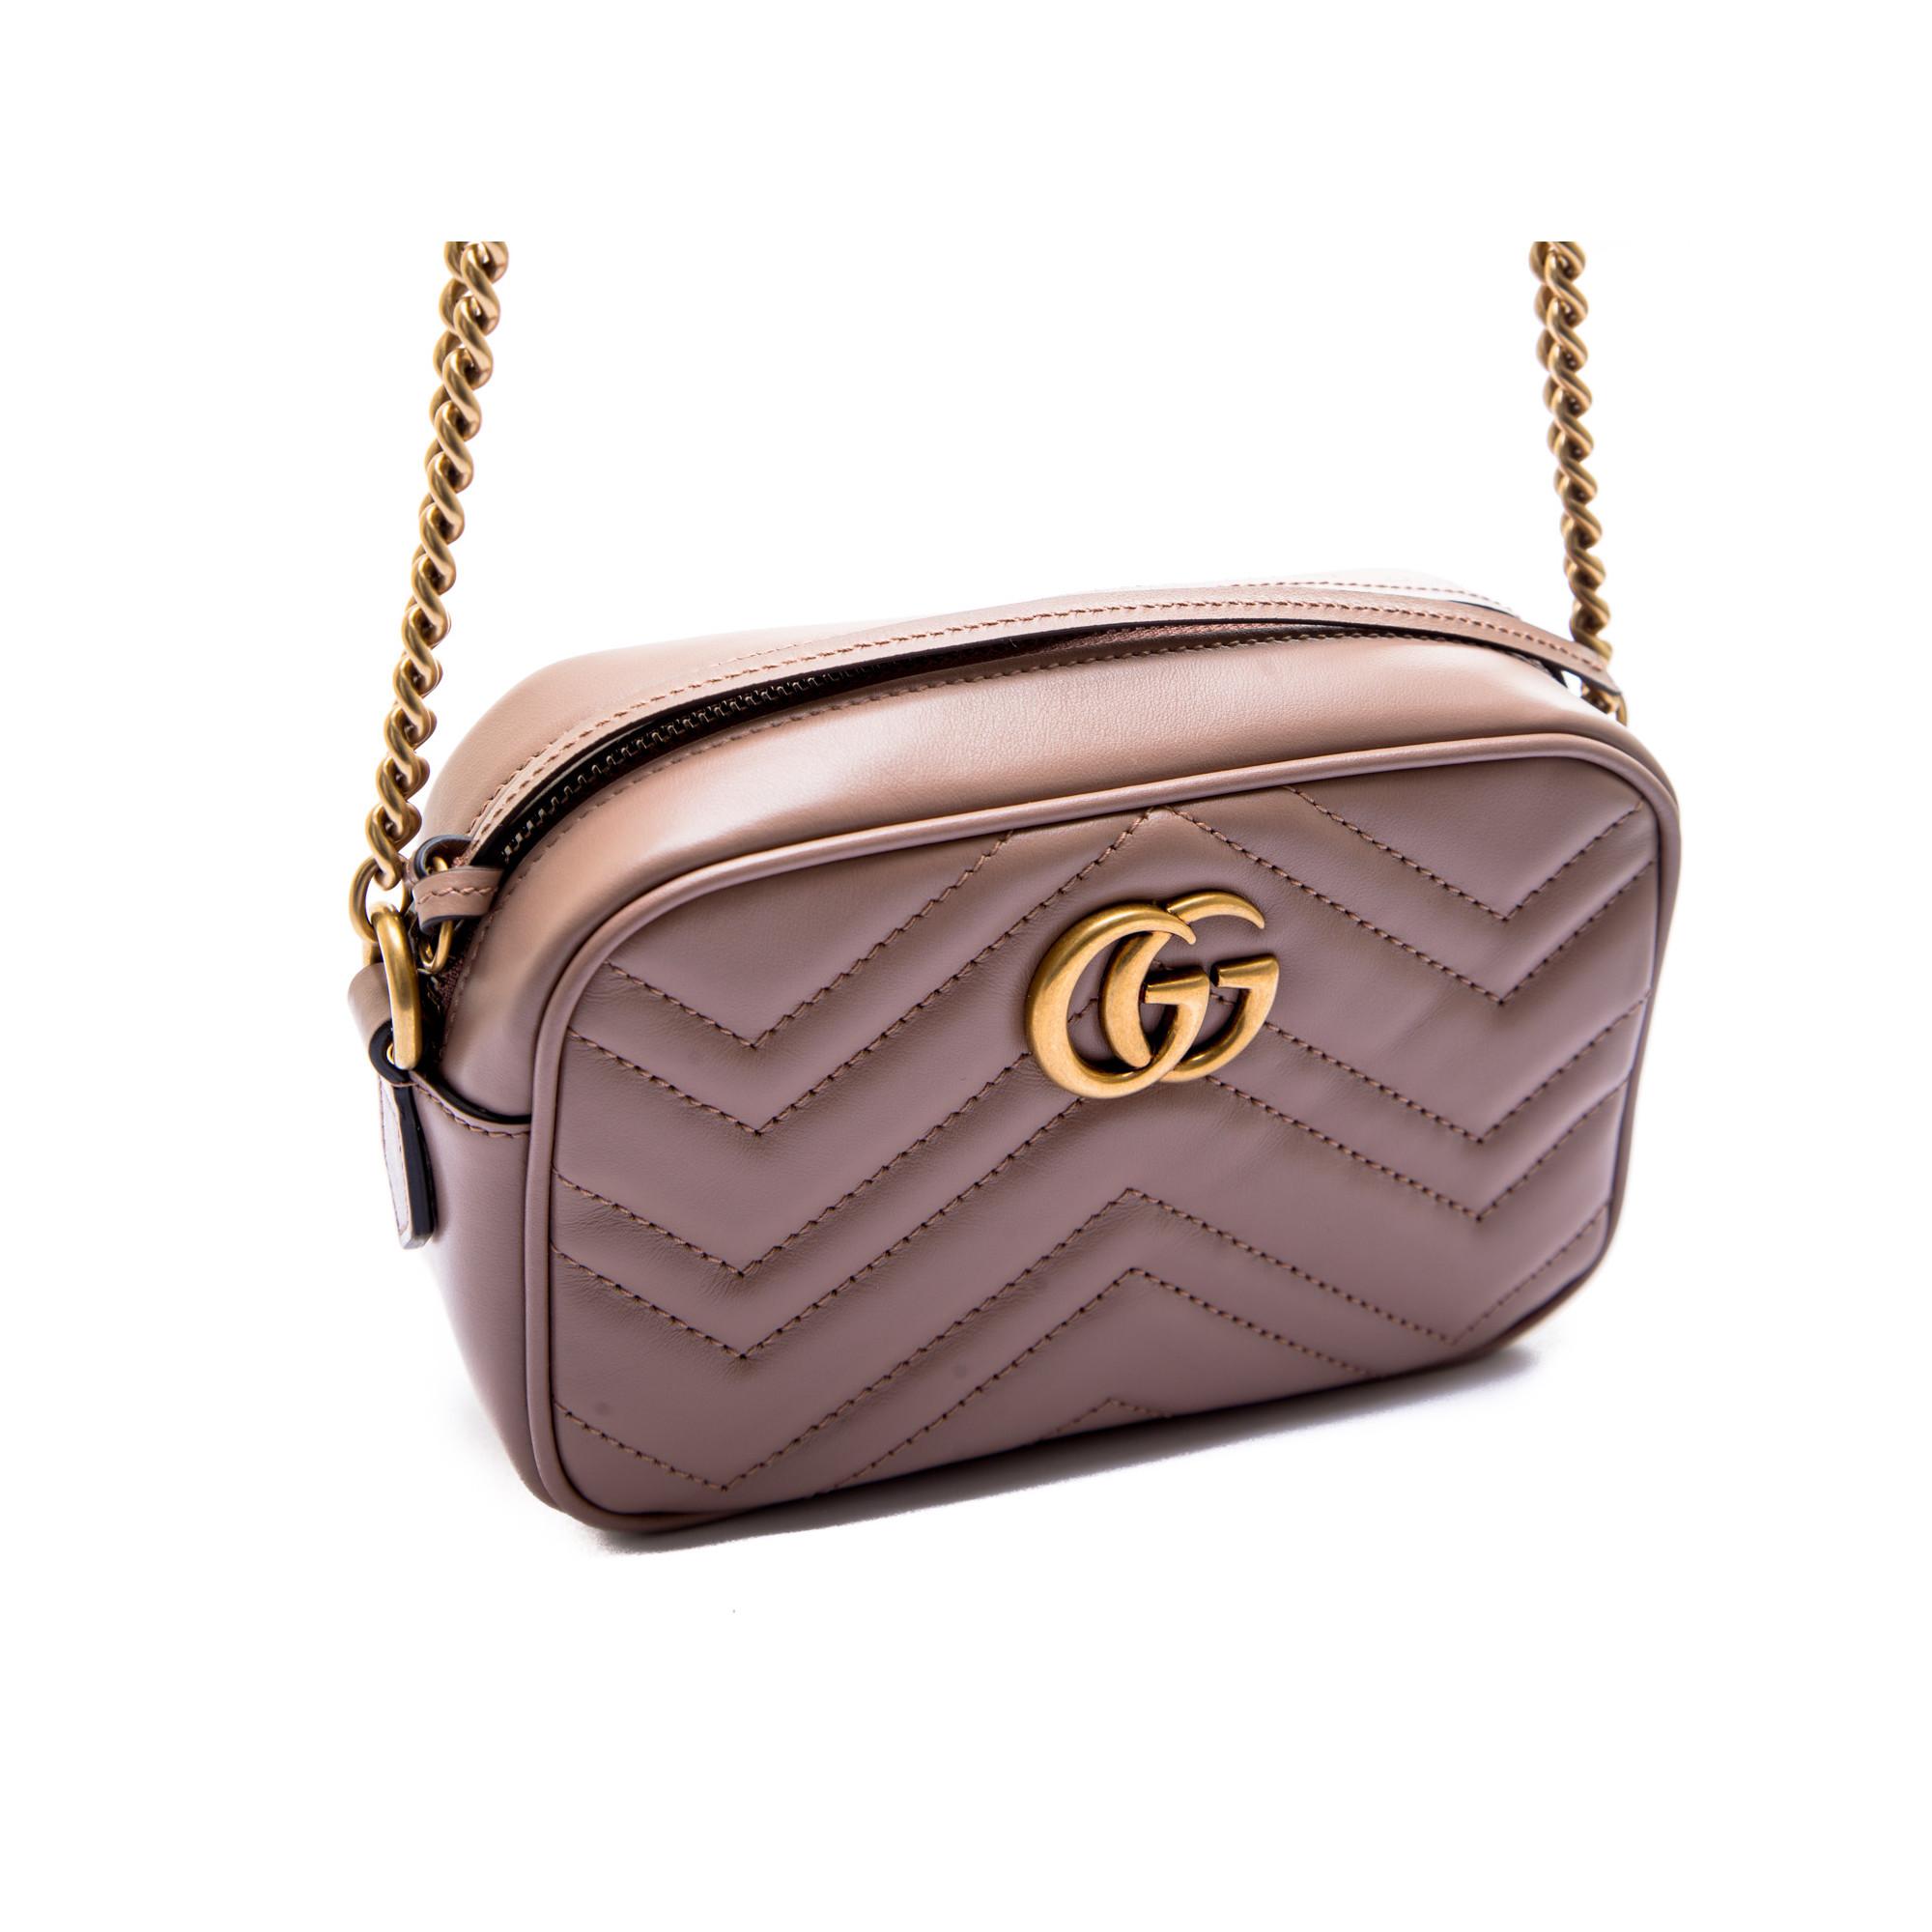 Gucci Diagonal GG Marmont Mini Shoulder Bag 474575 Nude